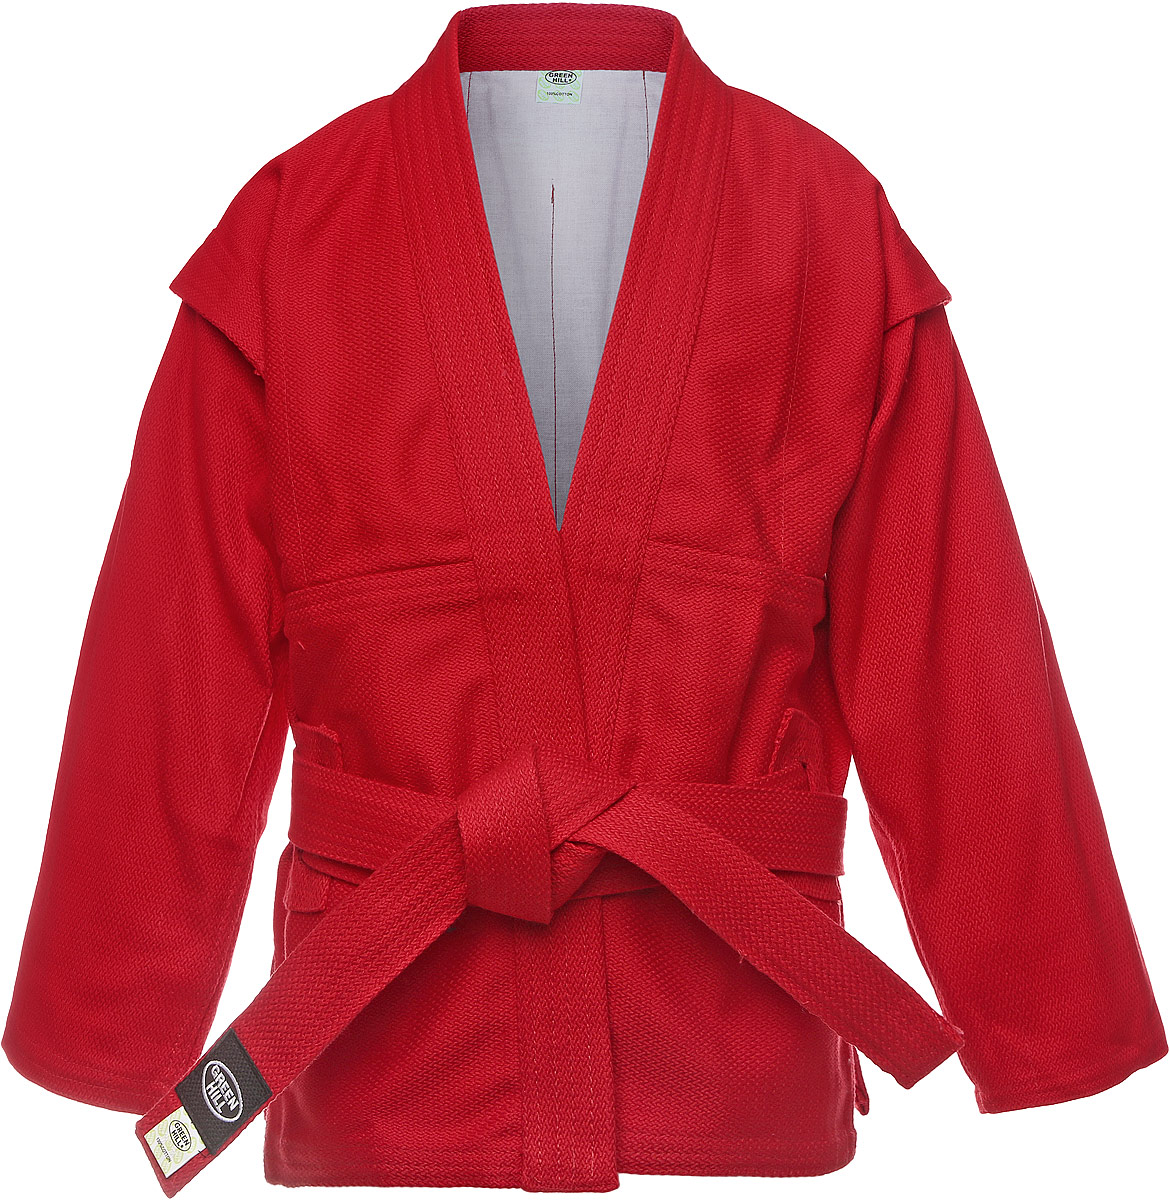 Куртка для самбо Green Hill, цвет: красный. SC-2002. Размер 6/190 green hill куртка для самбо green hill